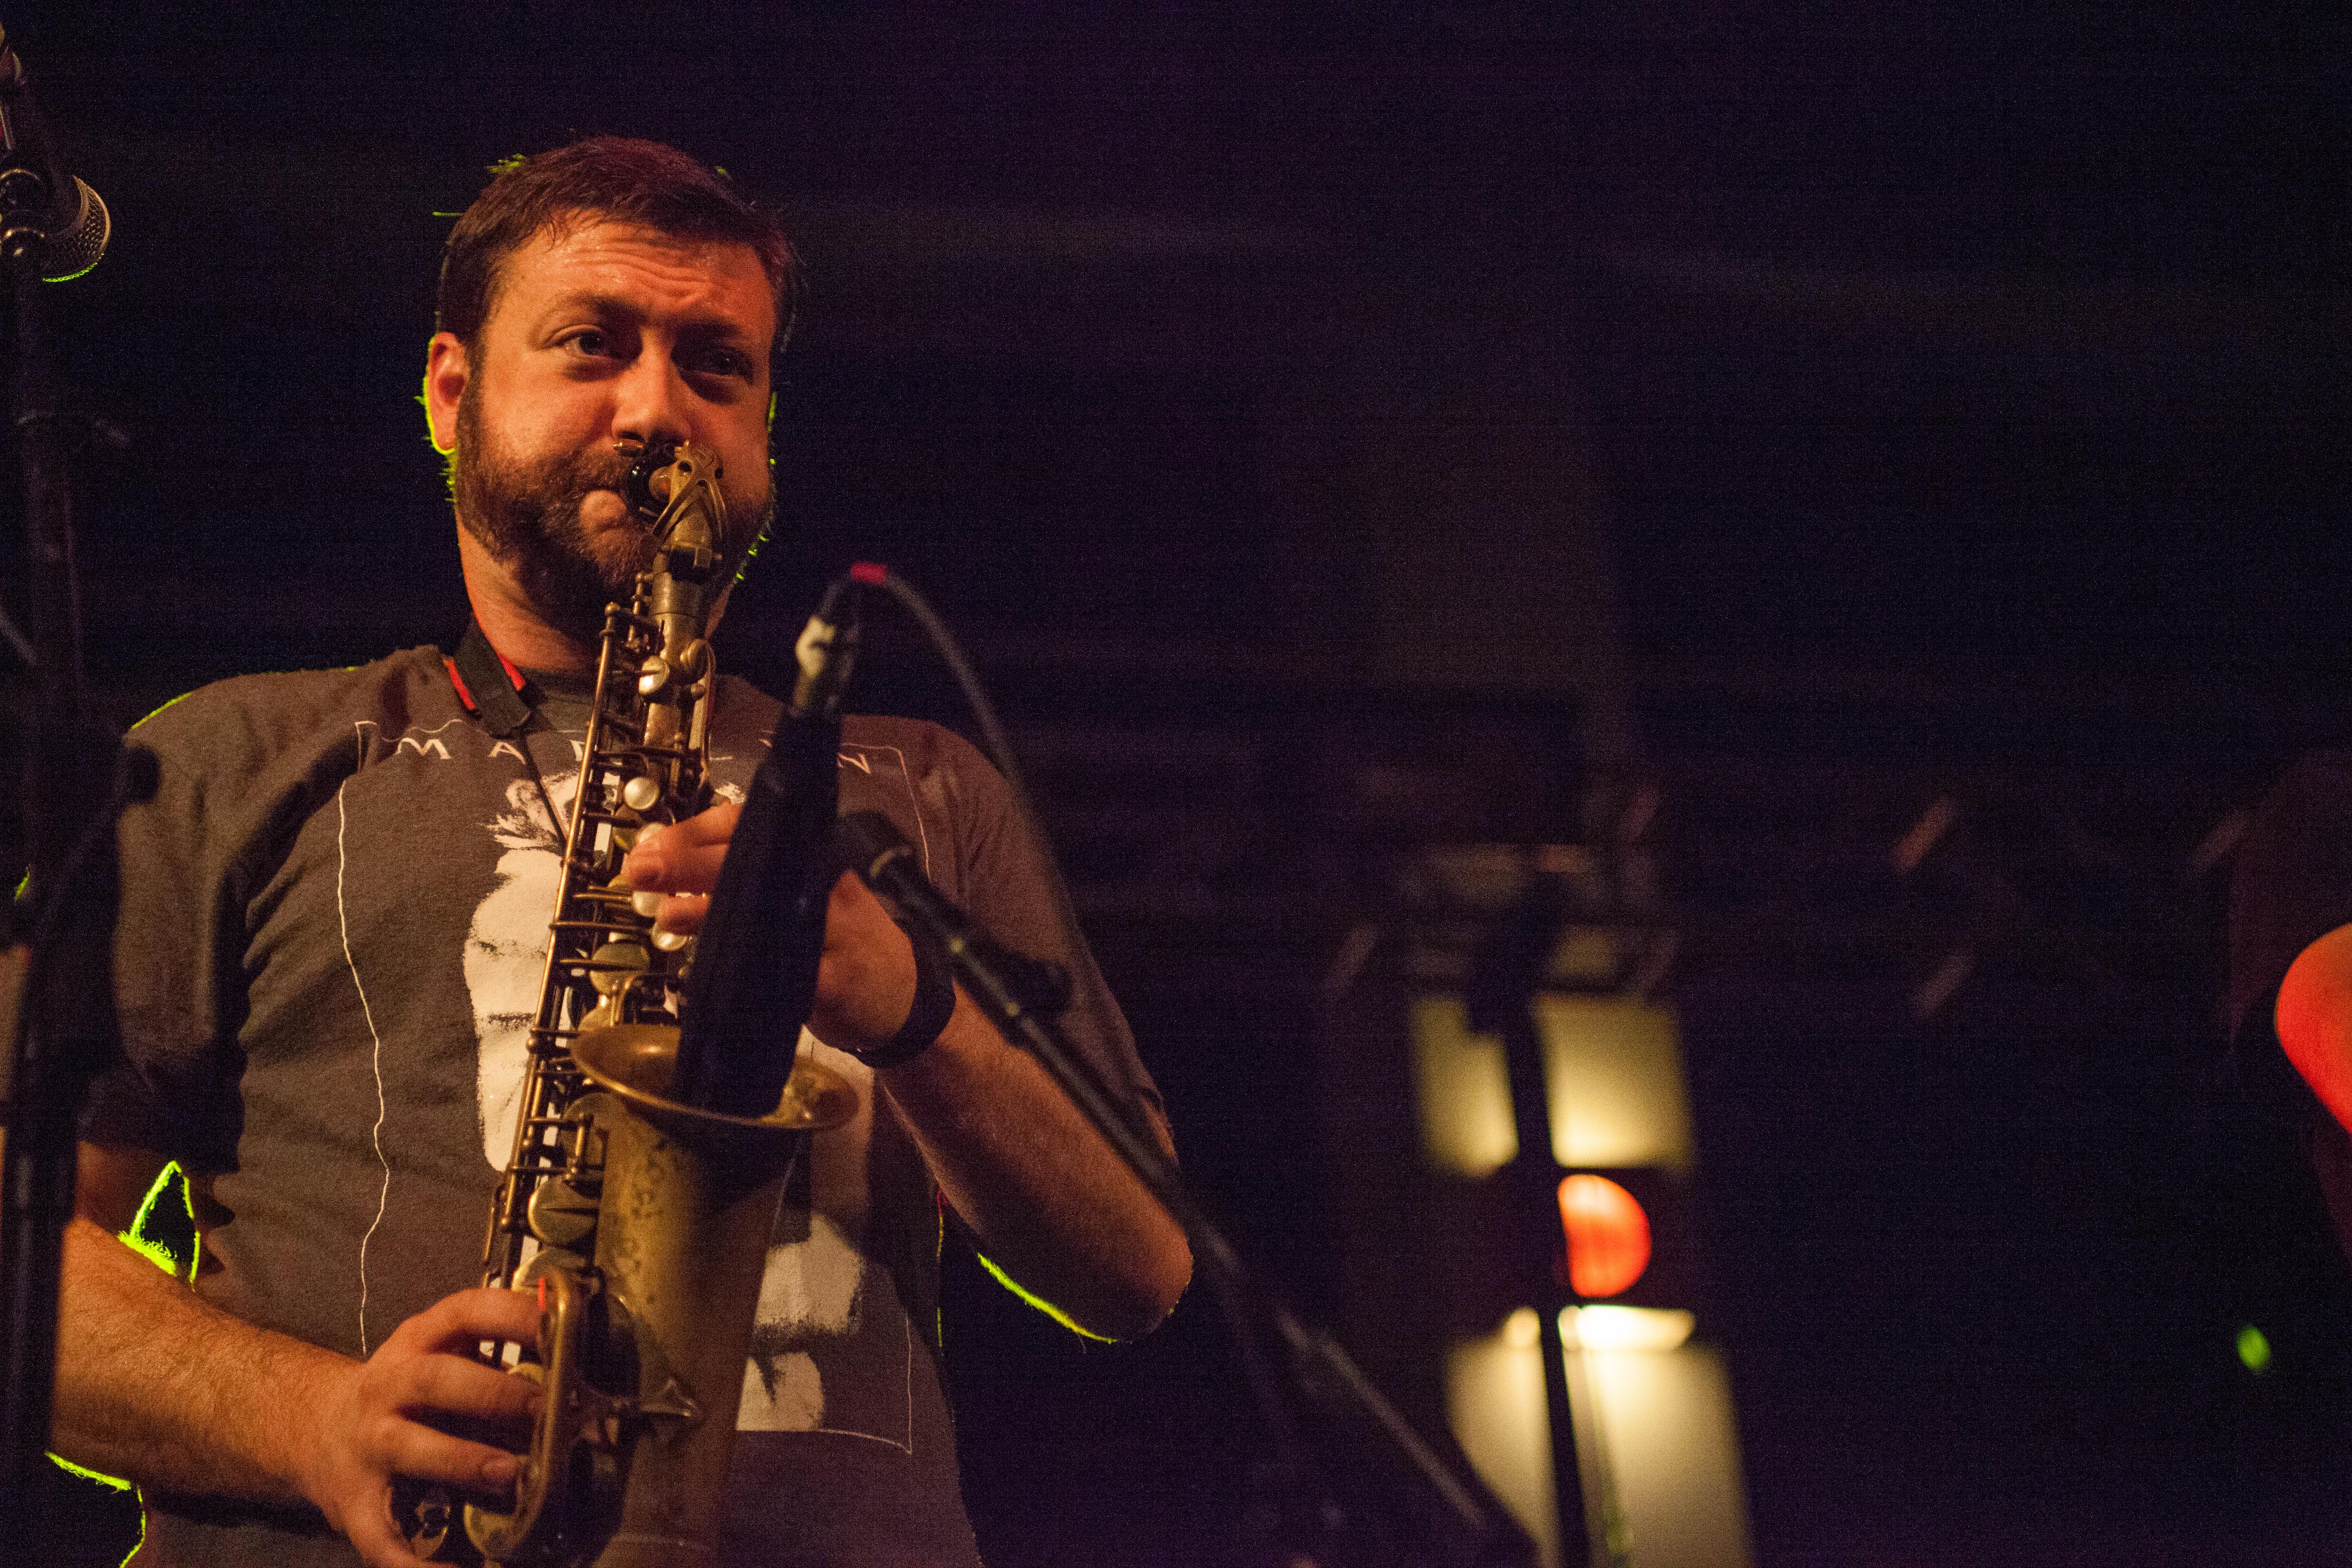 Jim Conti, above, has been the alto saxophone player for Streetlight Manifesto since 2003. KRYSTEN MASSA / THE STATESMAN